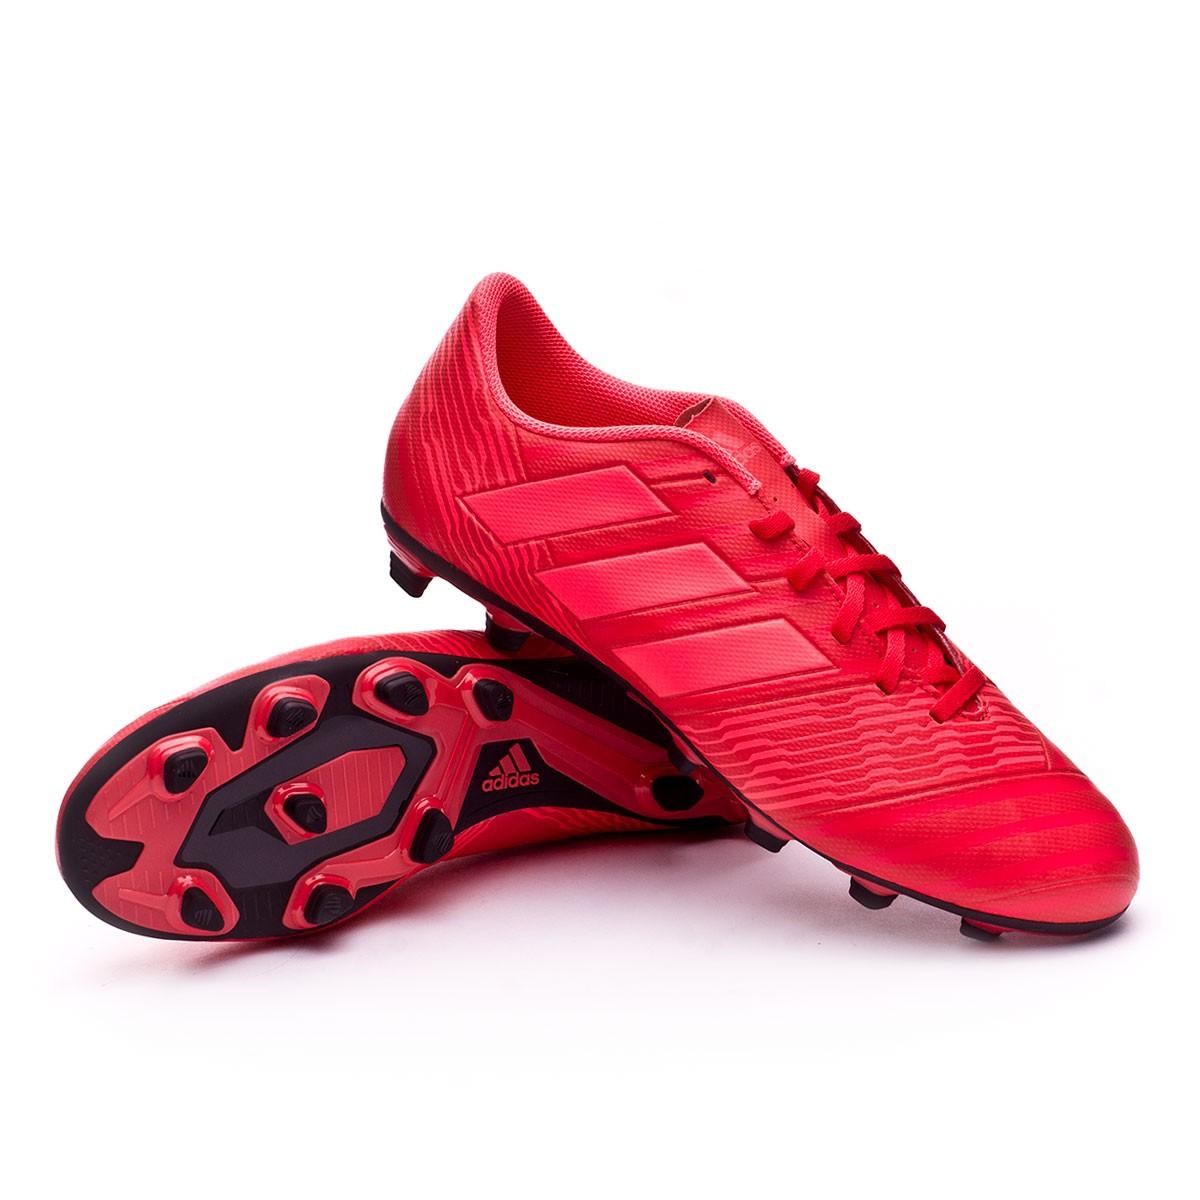 17 Coral Black FxG Real 4 adidas Nemeziz 4zCn0qwx5X